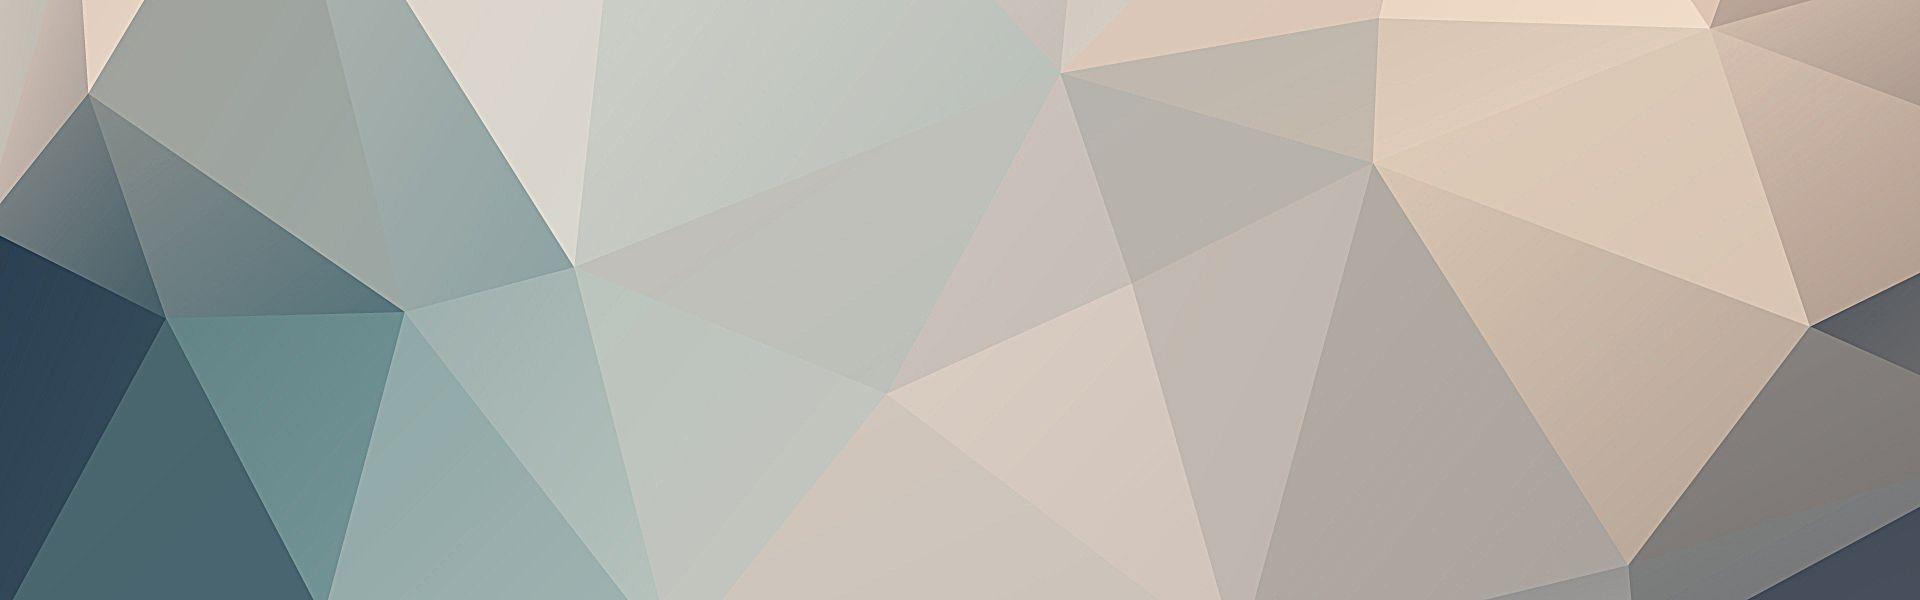 Abstract Background Abstract Abstract Backgrounds Dual Monitor